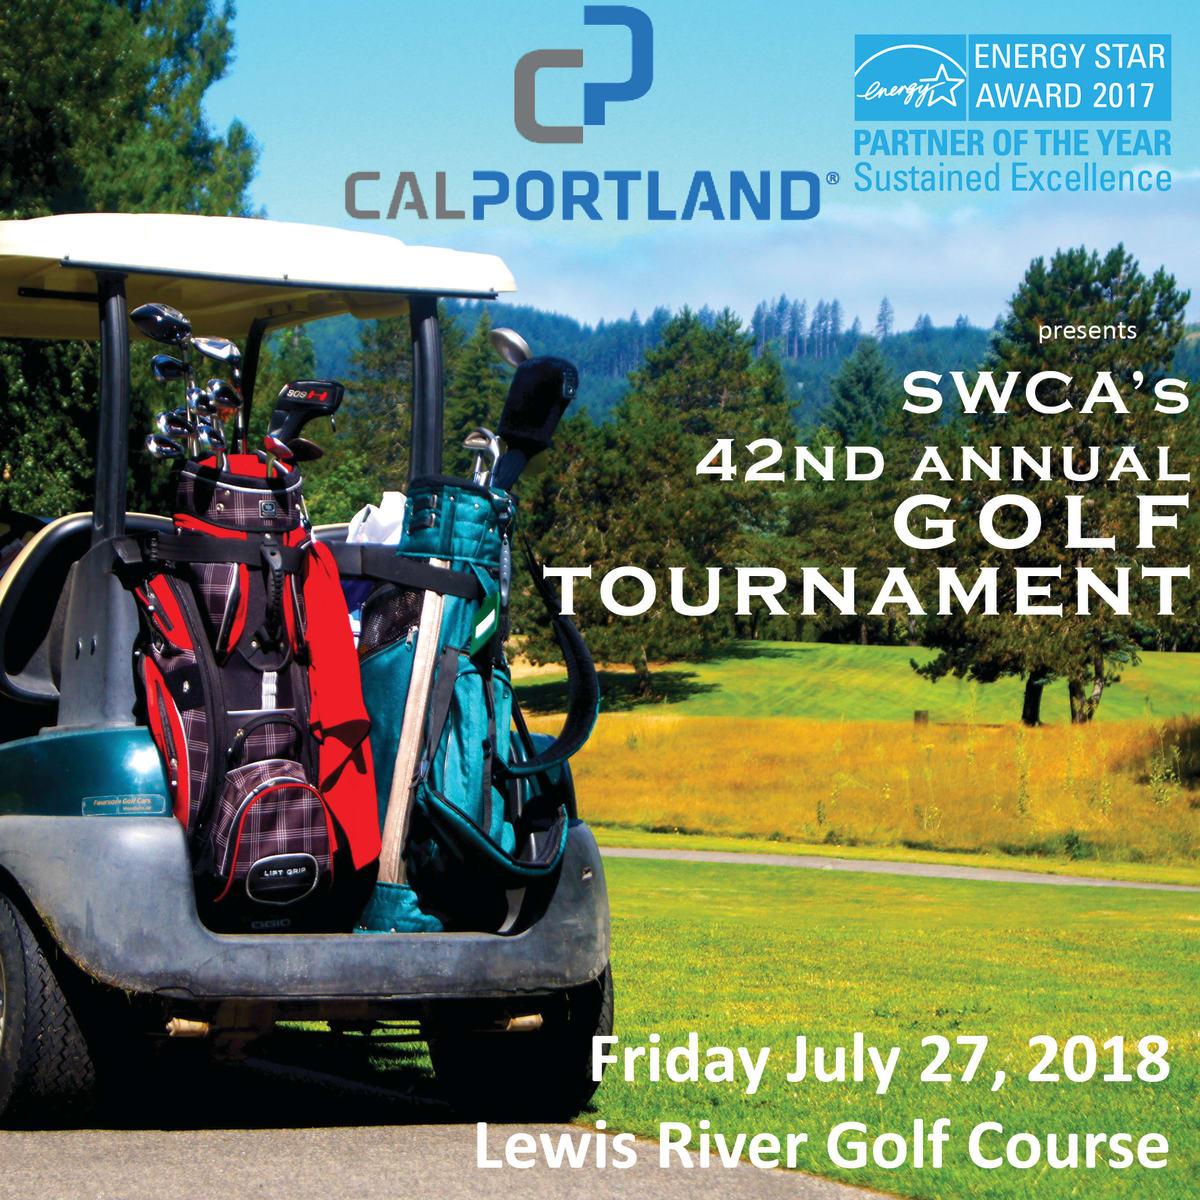 SWCA 42nd Annual Golf Tournament presented by CalPortland